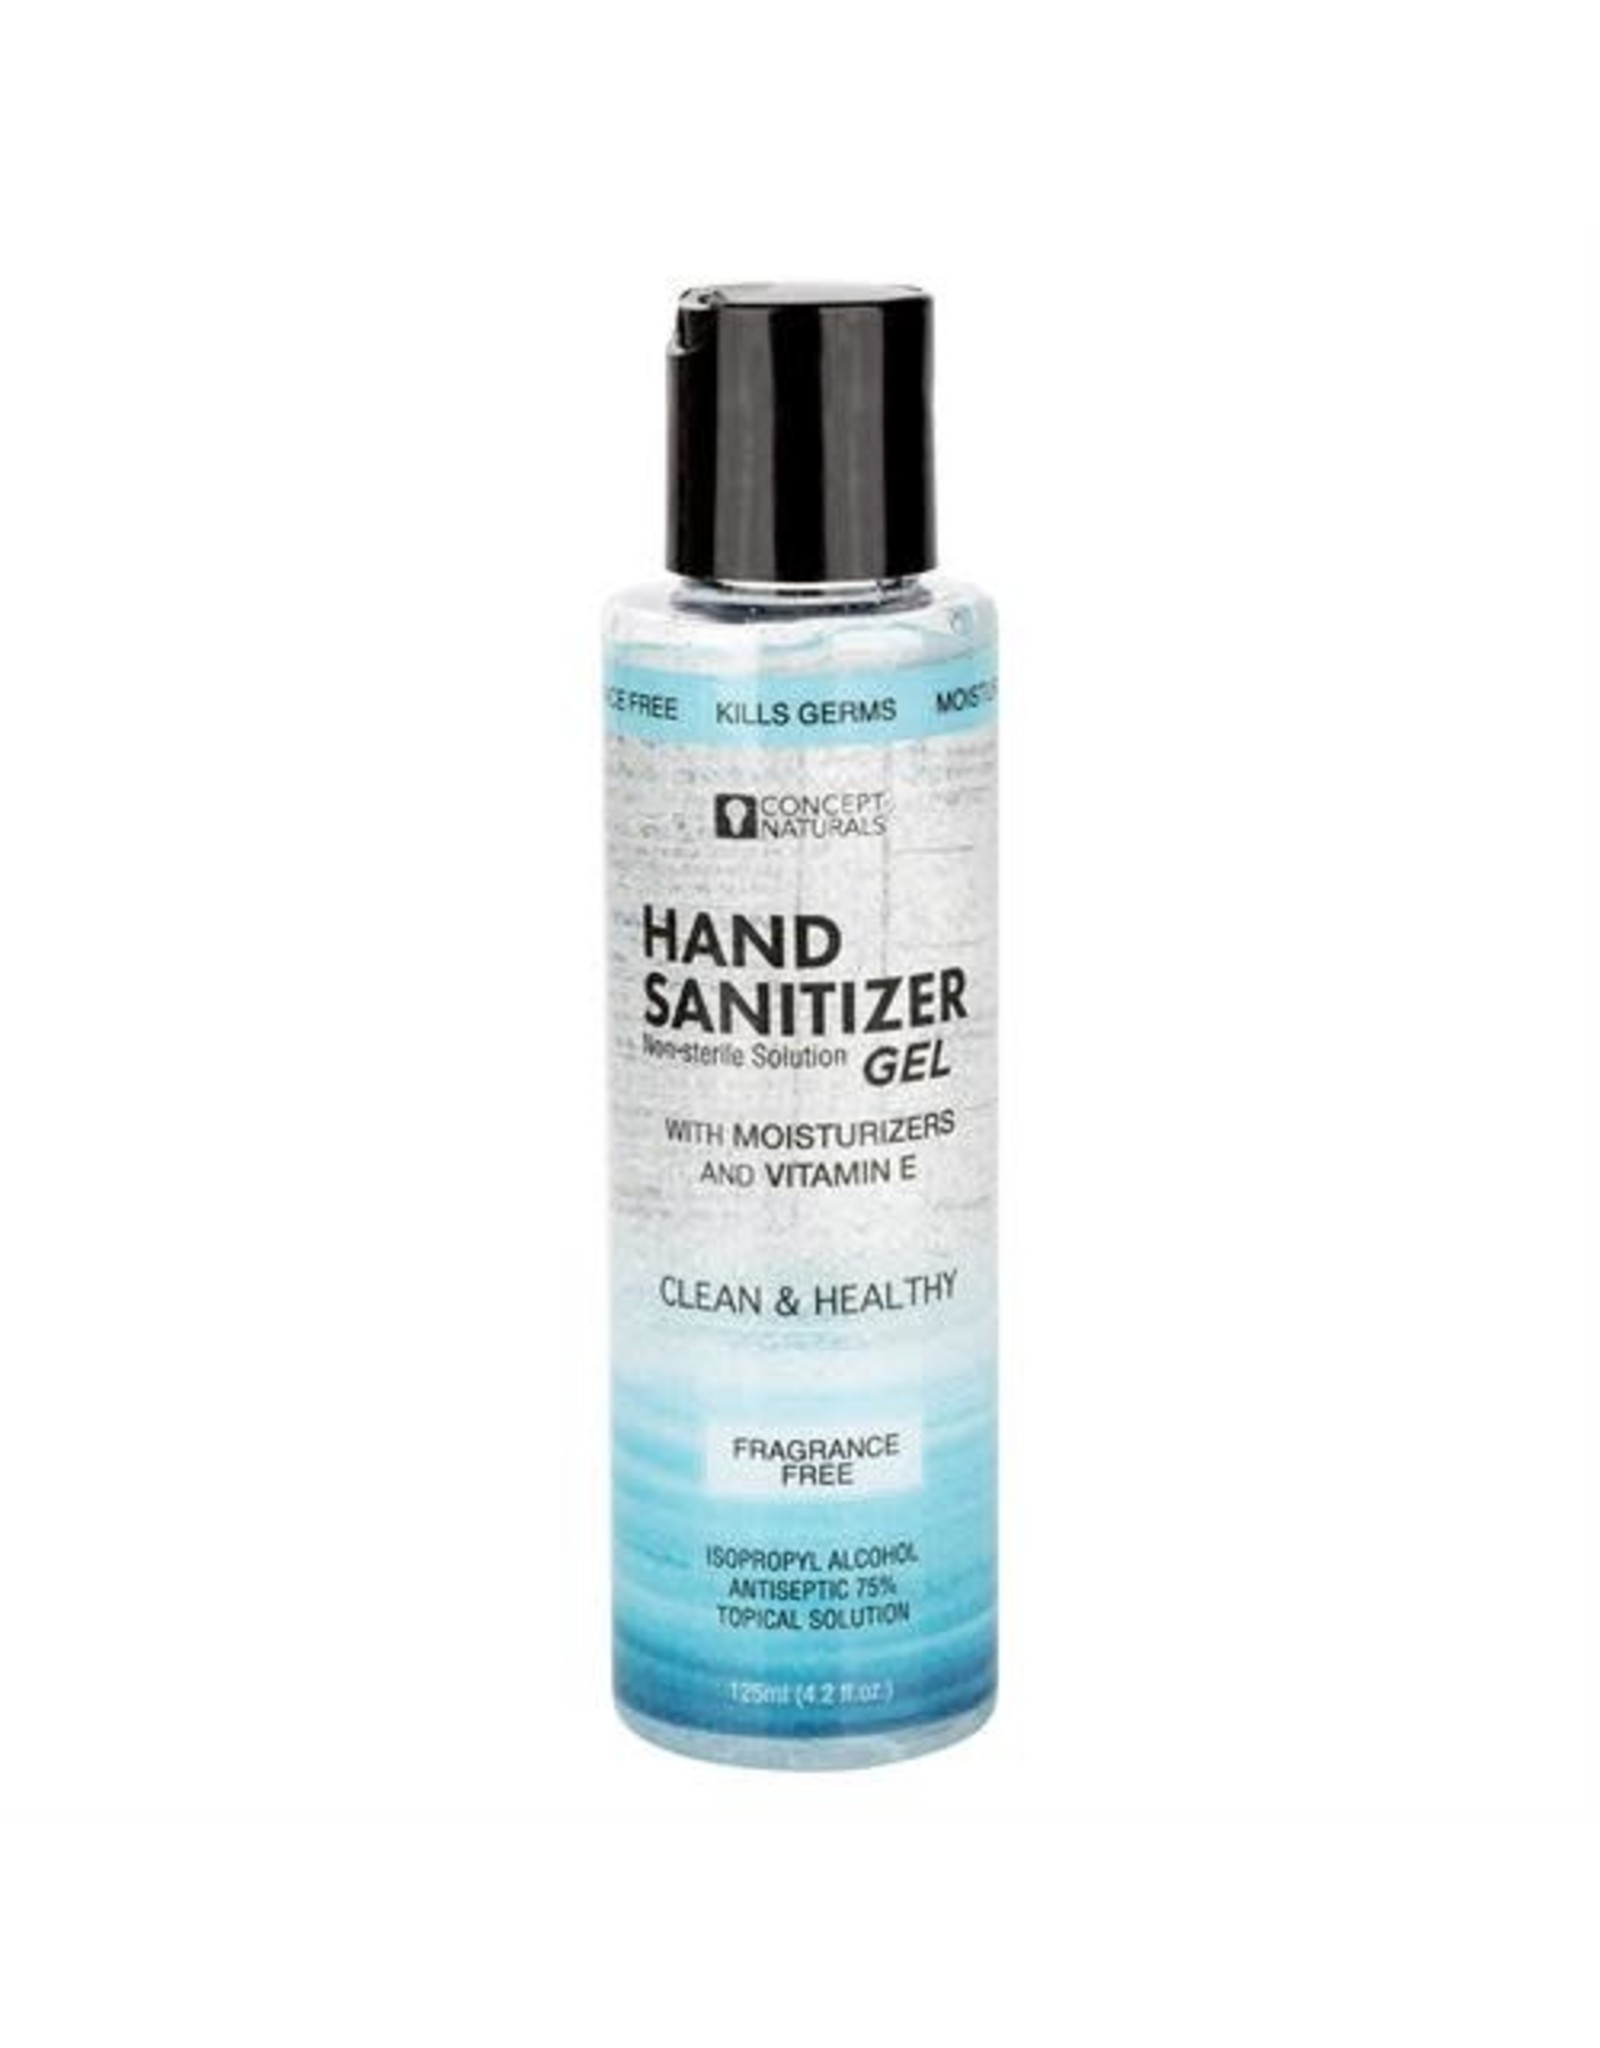 Cal Exotics Cal Exotics Hand Sanitizer Gel 4.2oz